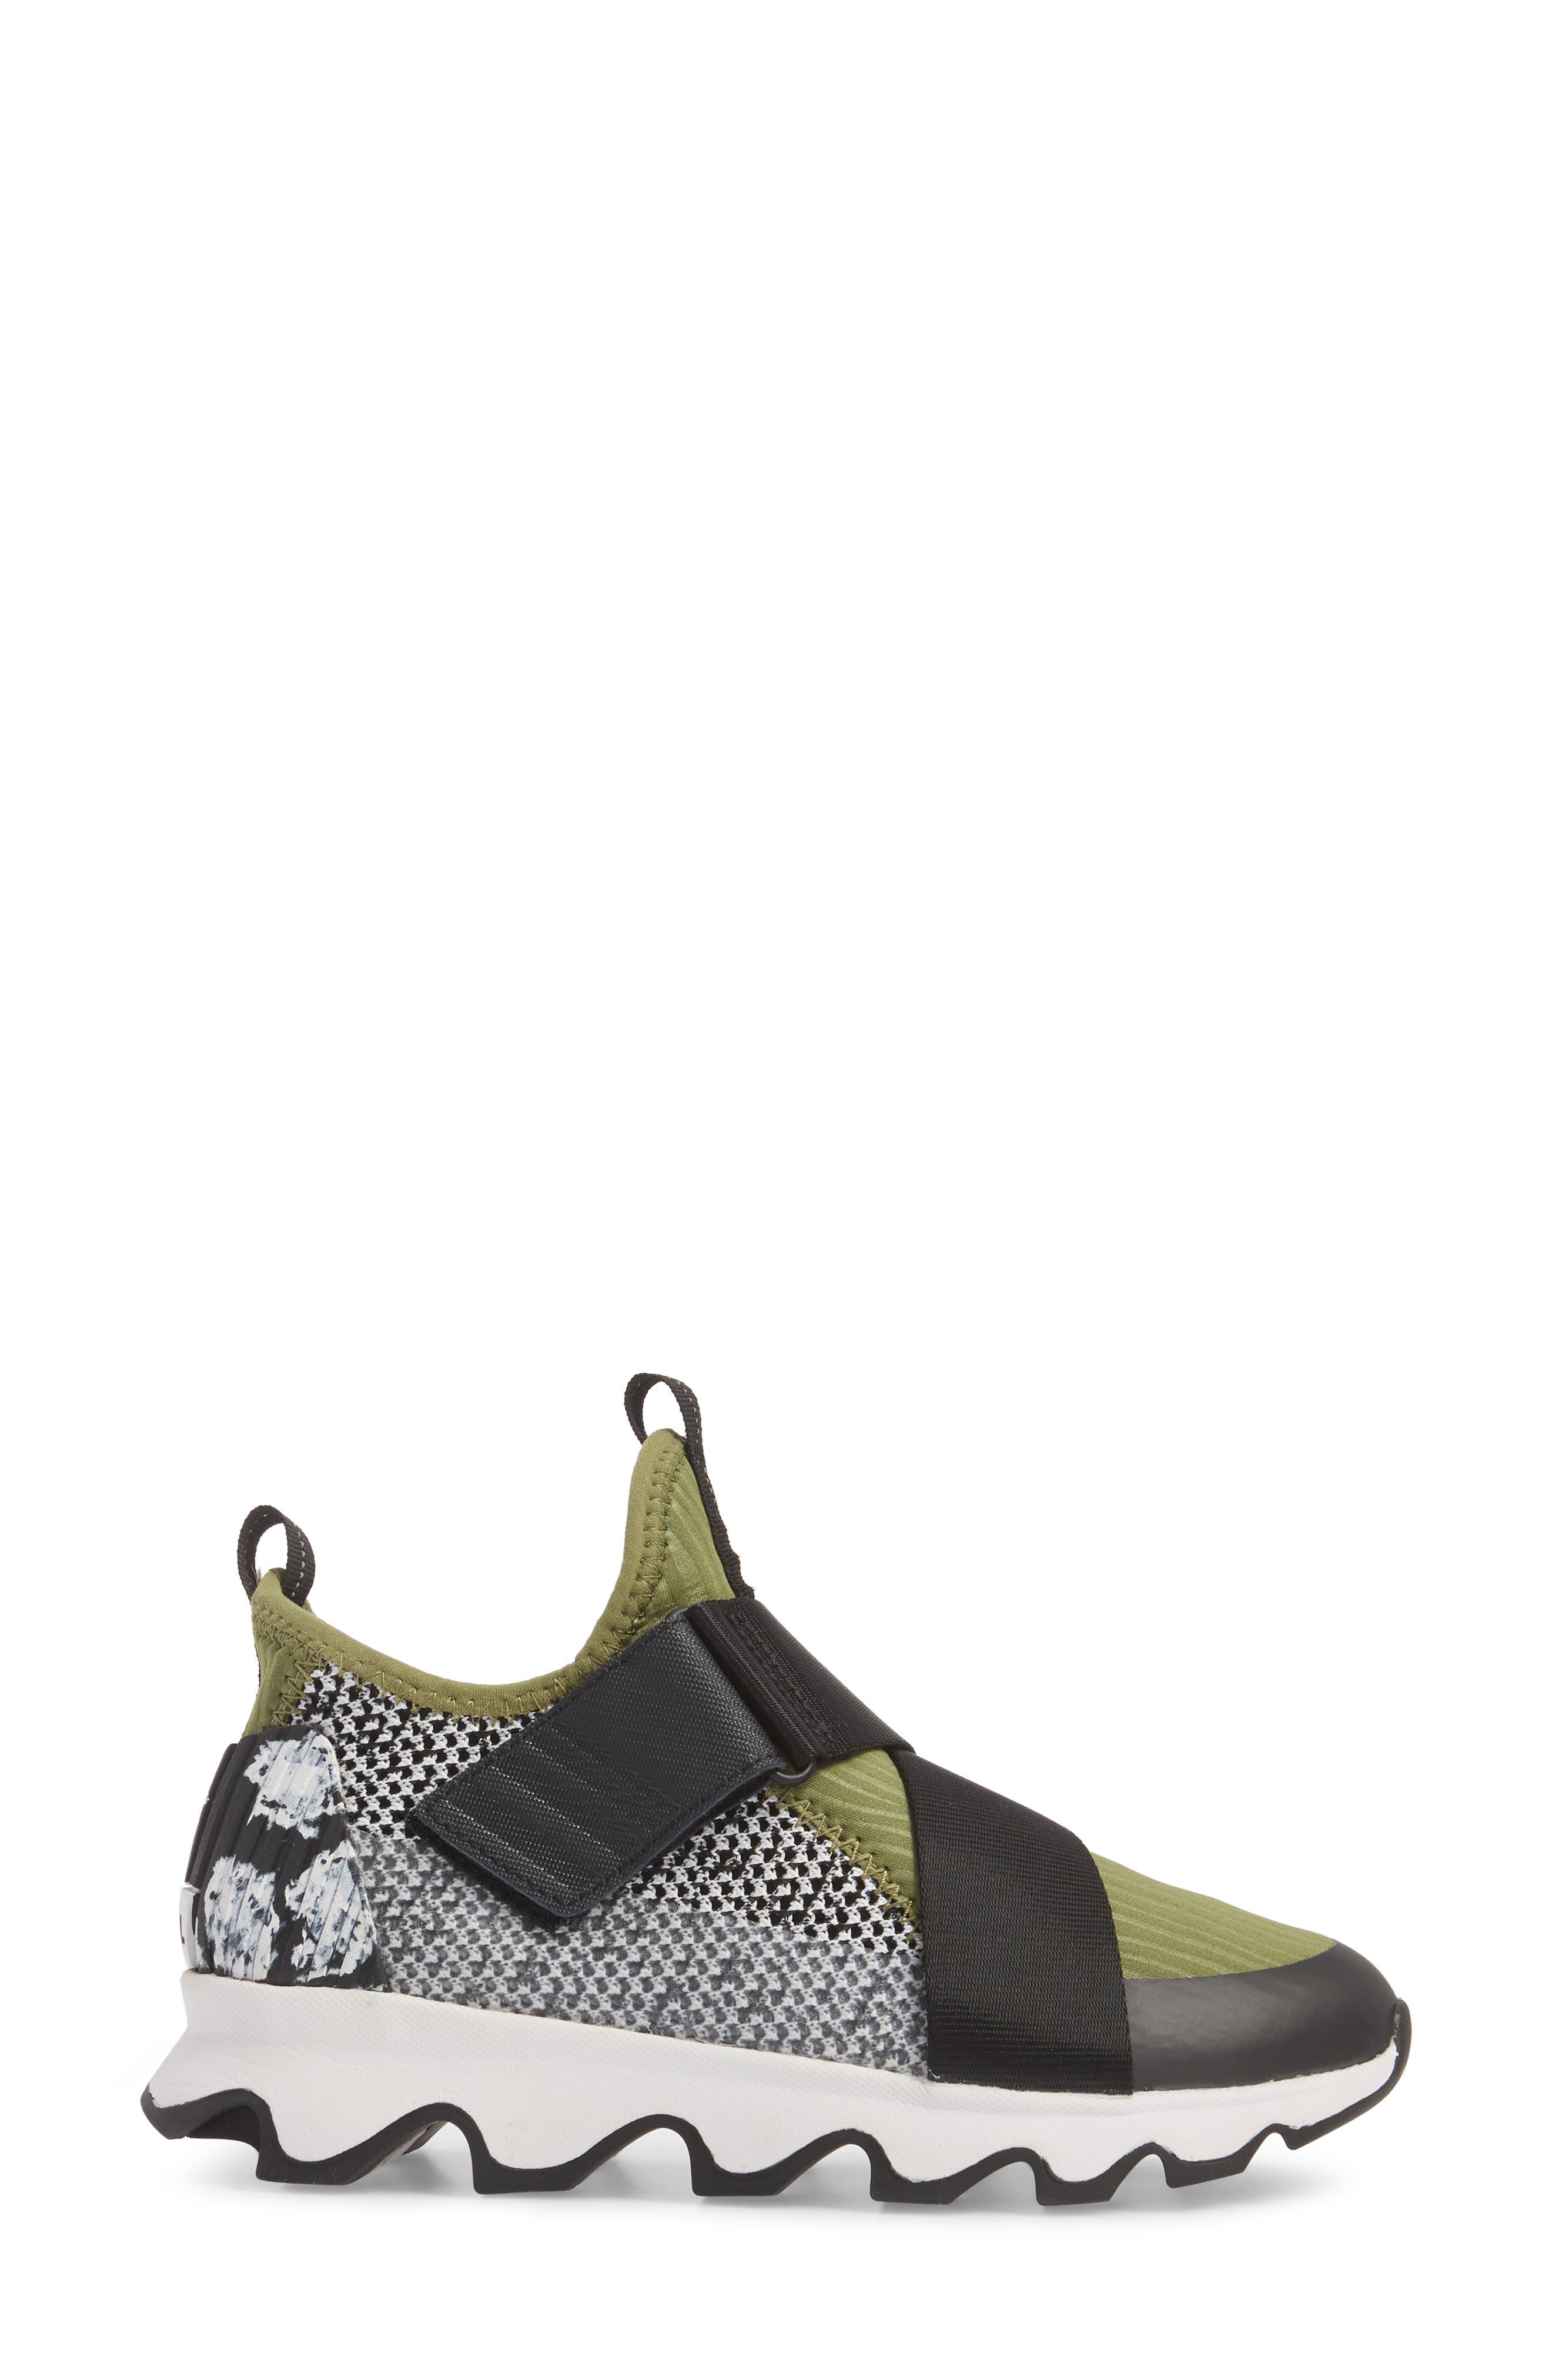 Kinetic Sneak High Top Sneaker,                             Alternate thumbnail 3, color,                             Olive Drab/ White